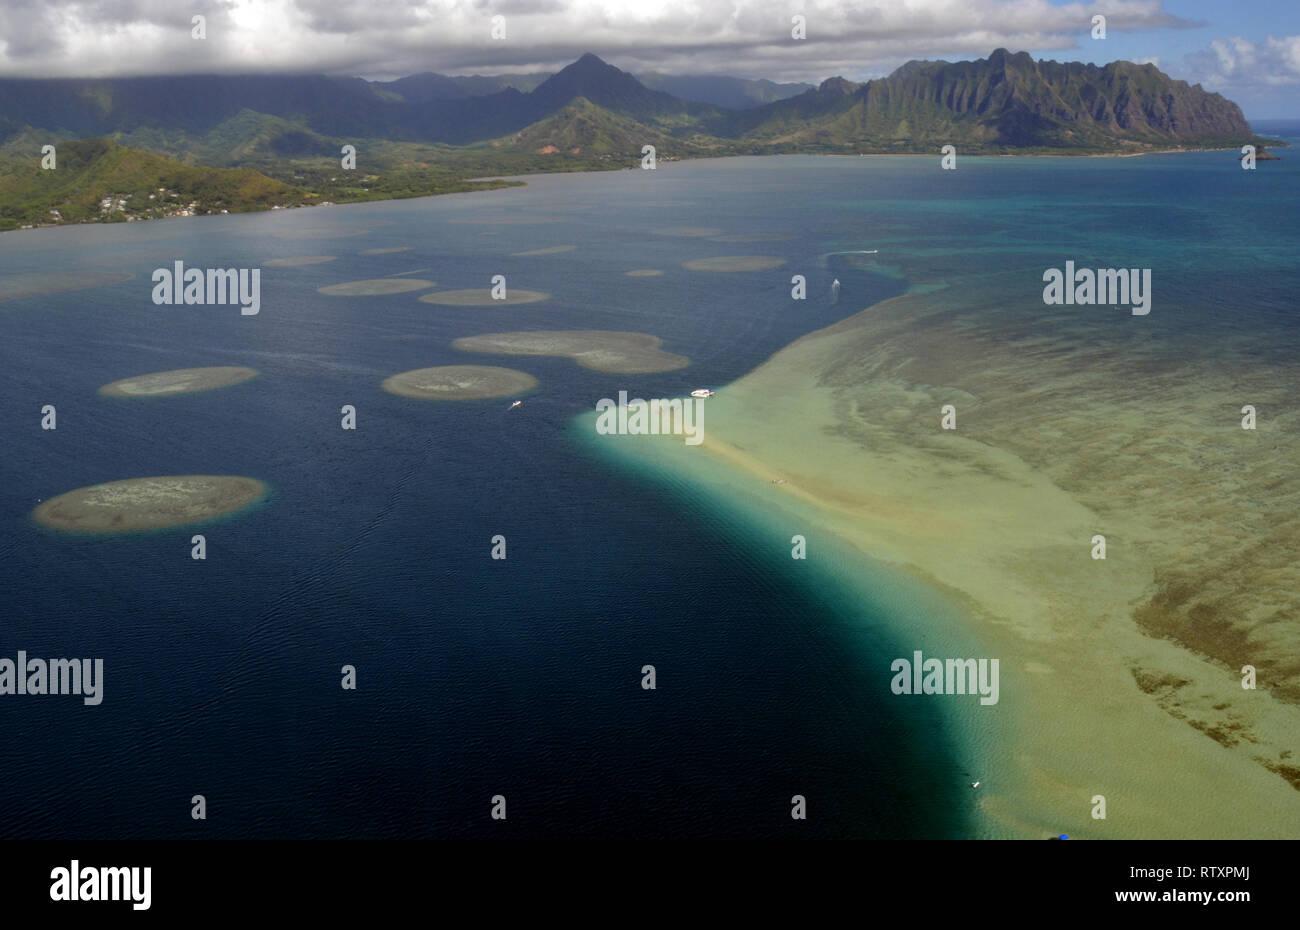 Vista aerea di banchi di sabbia e scogliere coralline di Kaneohe Bay, Oahu, Hawaii, STATI UNITI D'AMERICA Immagini Stock